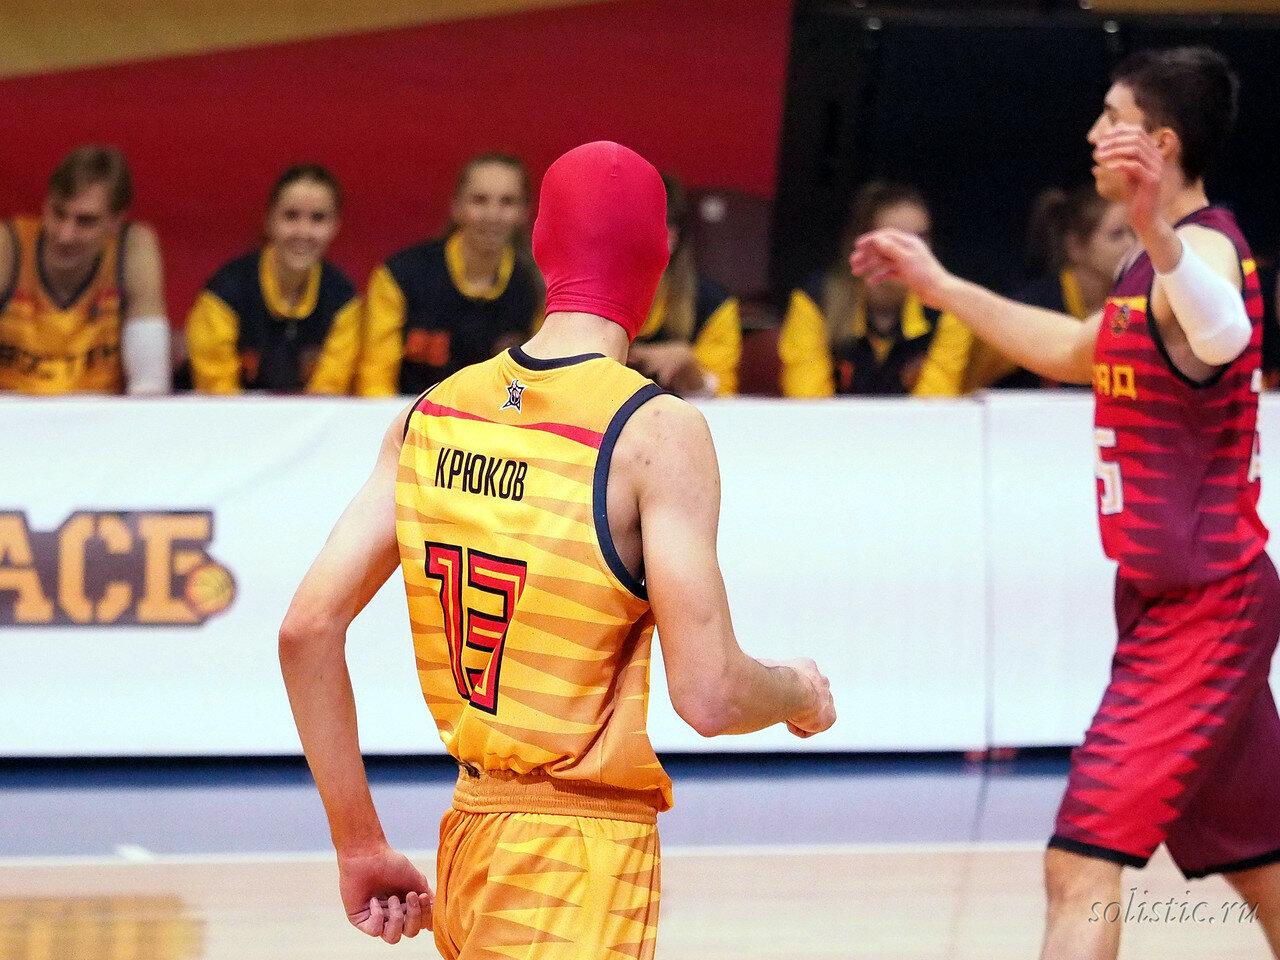 81 Матч звезд АСБ 2018 (ассоциации студенческого баскетбола)